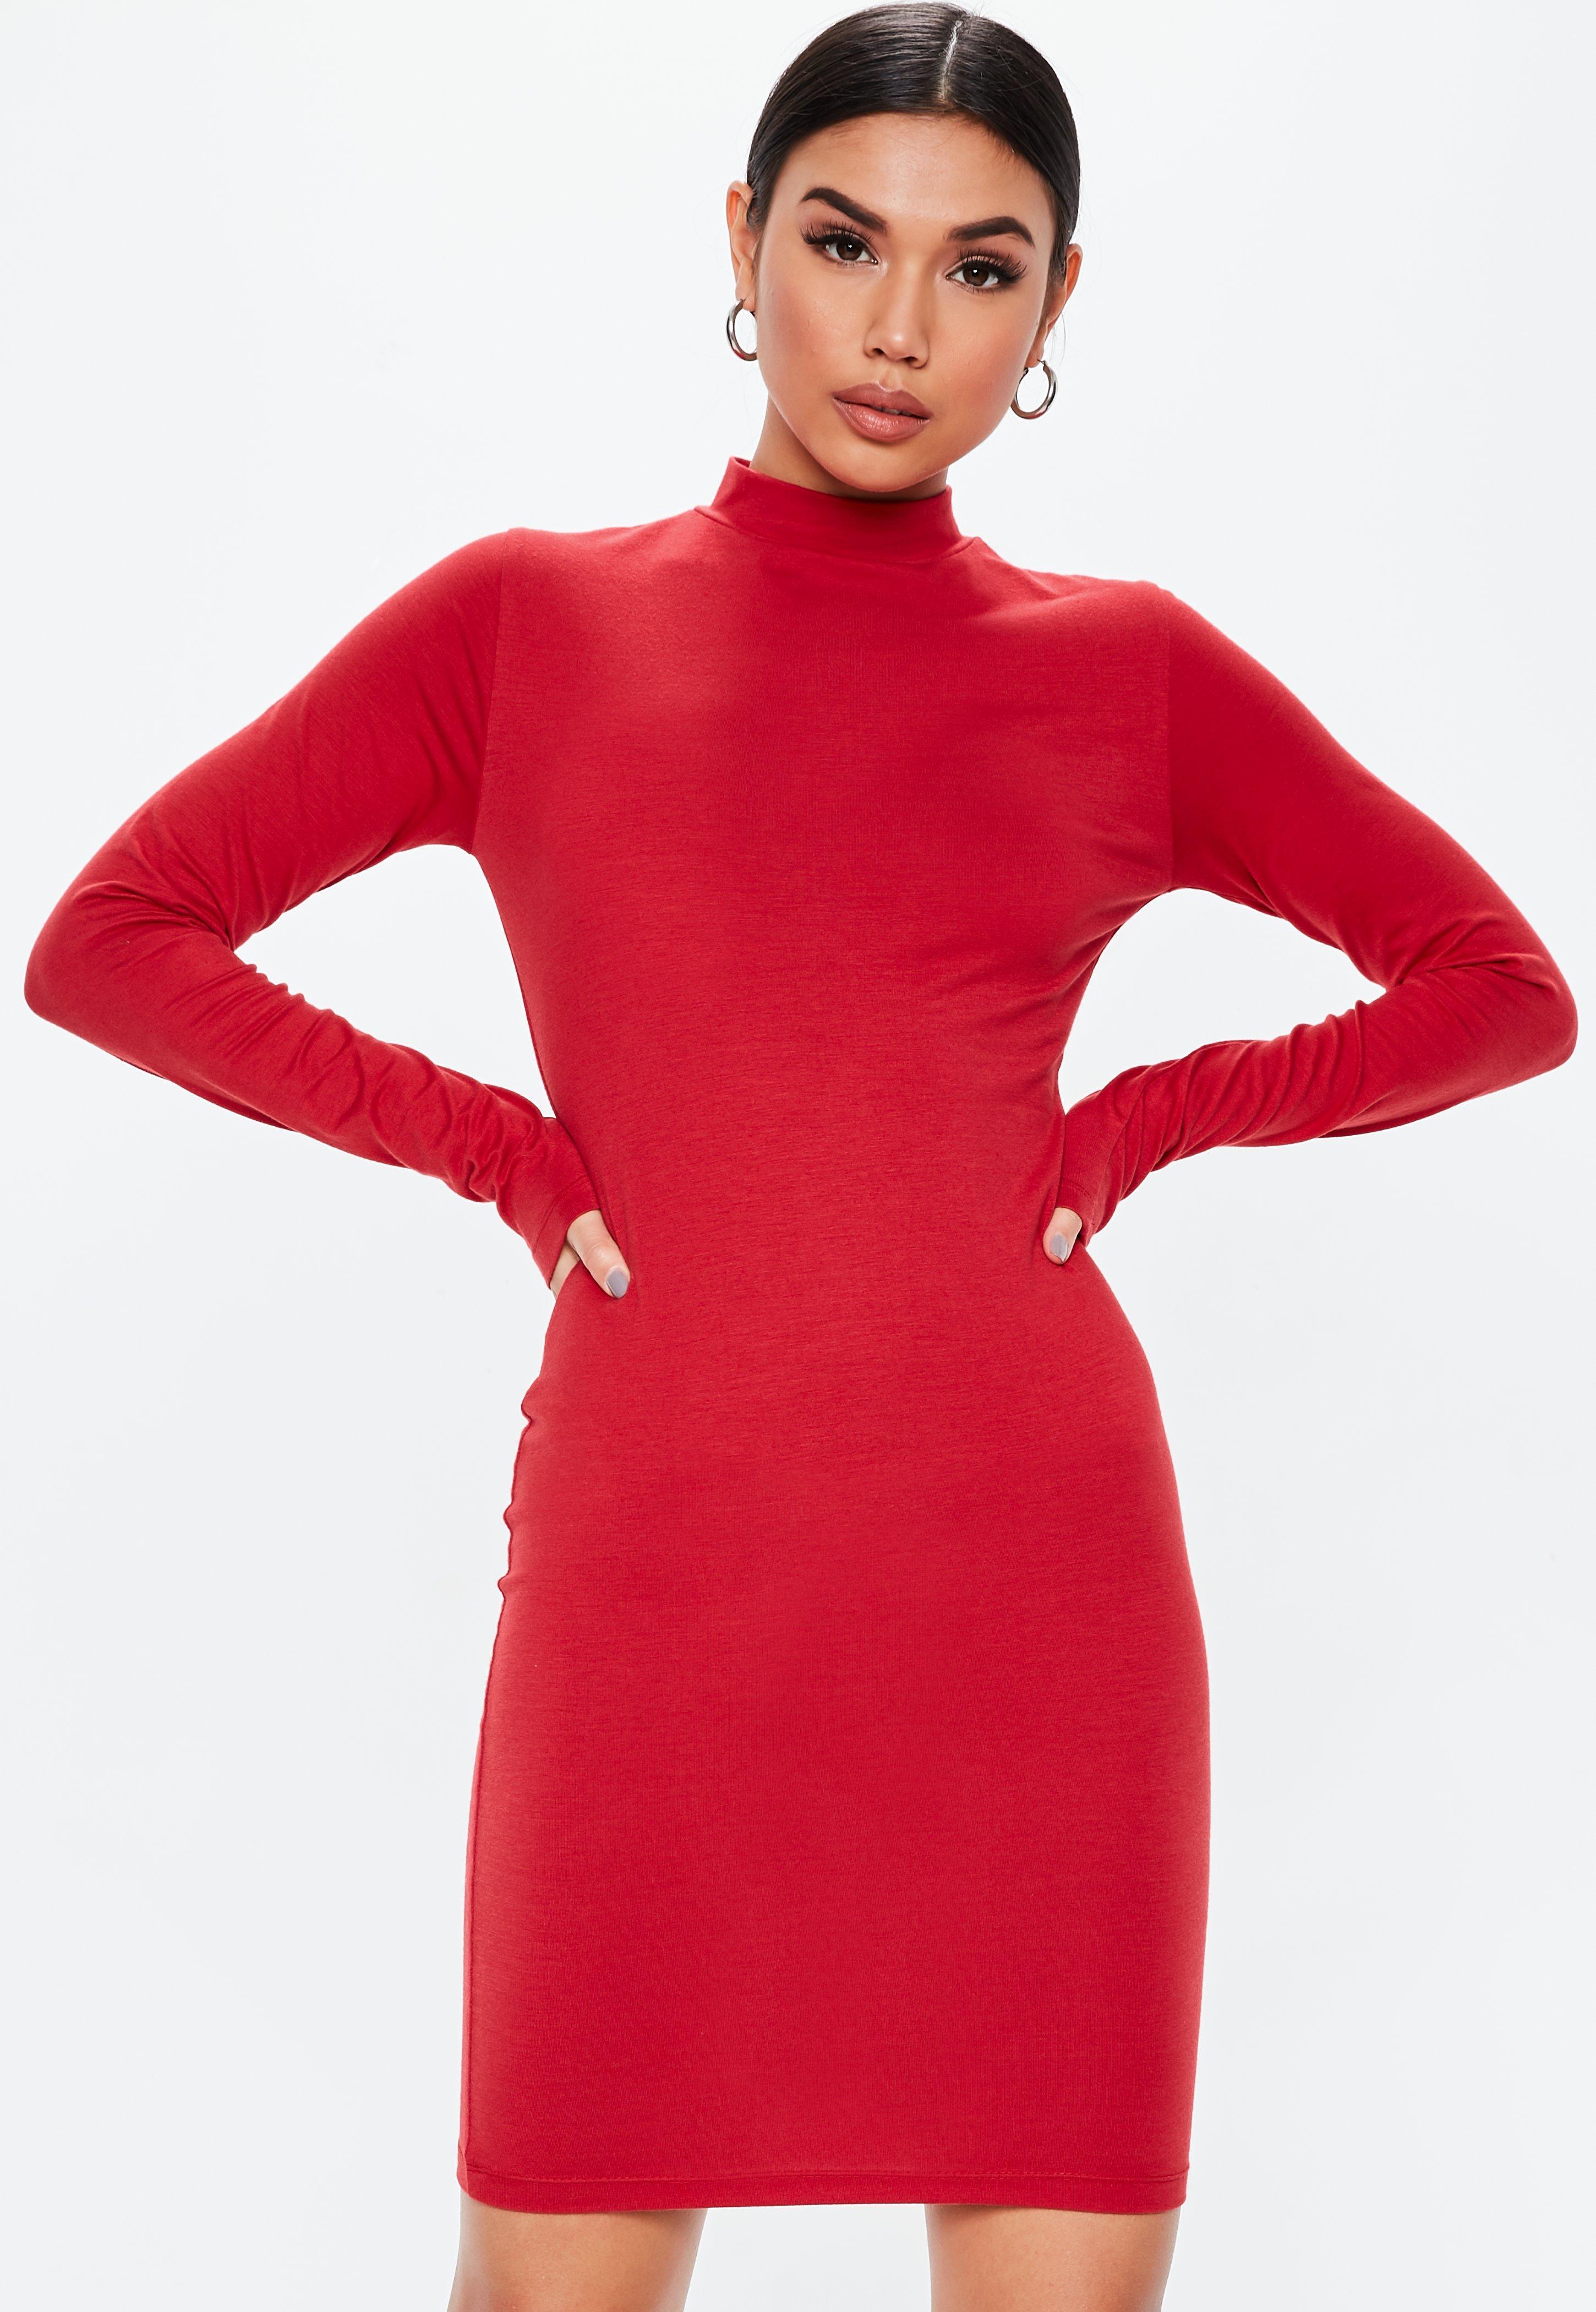 721bd3c94a0 Red Dresses